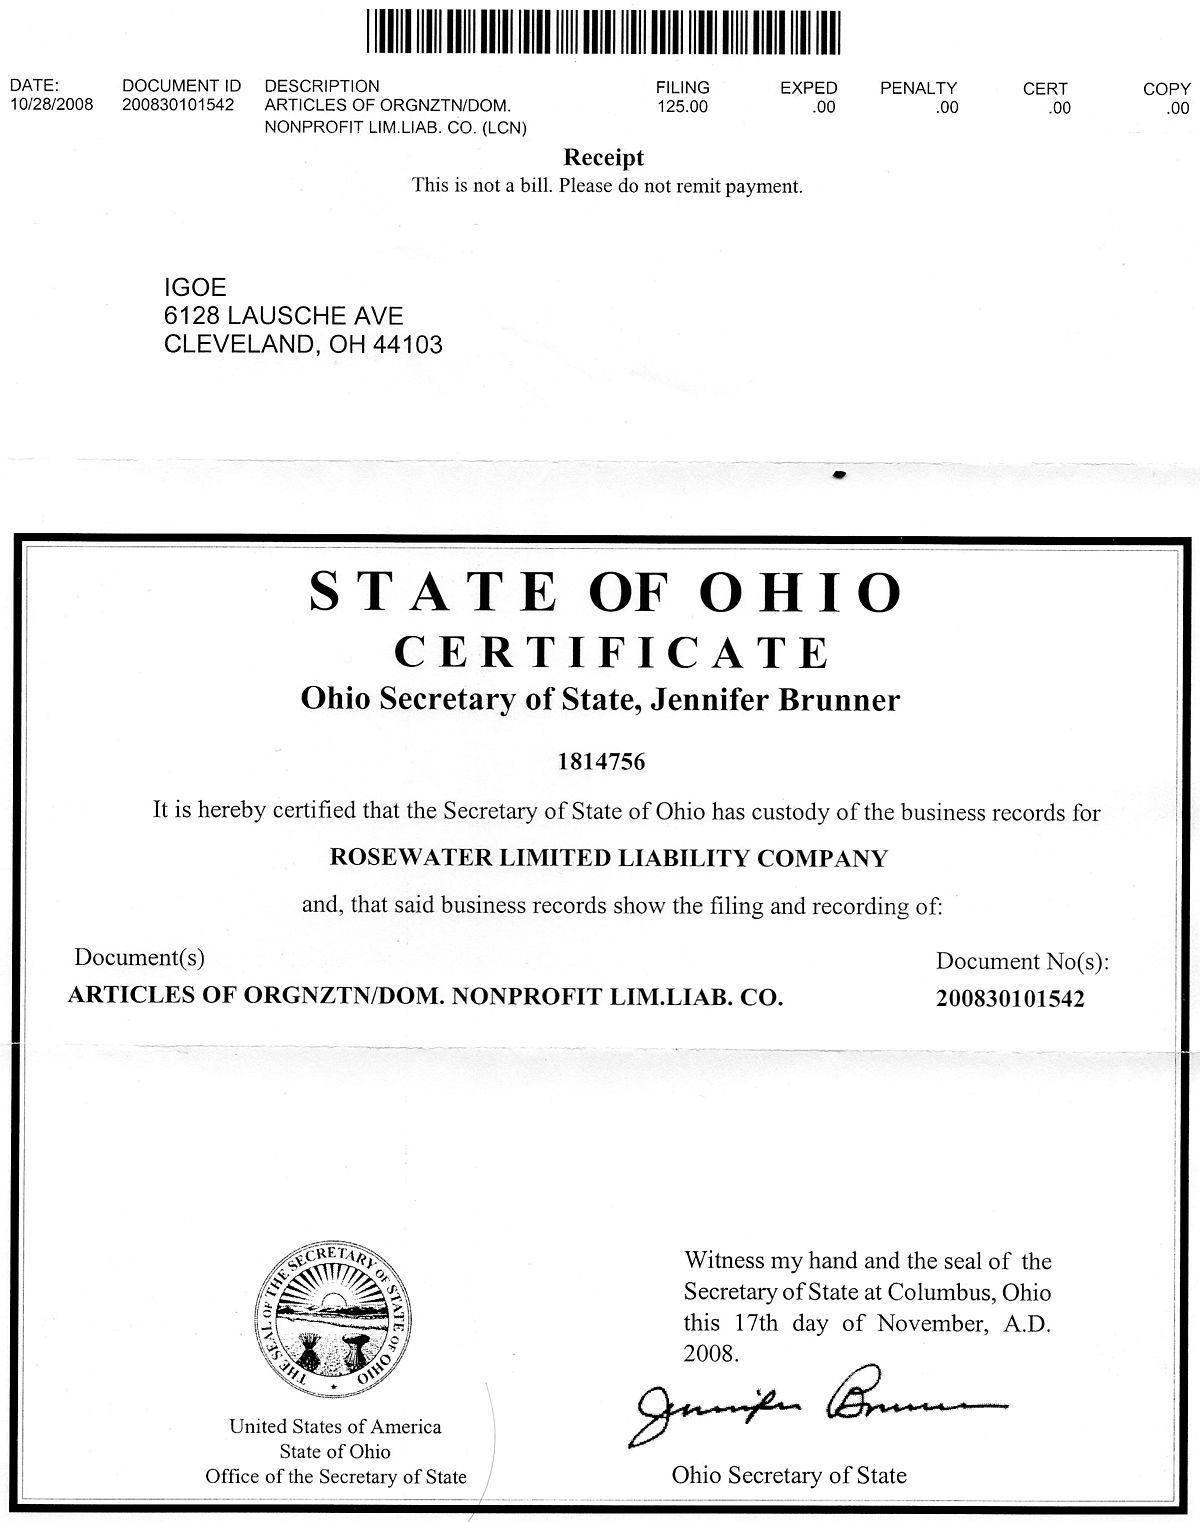 Rosewater Limited Liability Company - Wikipedia